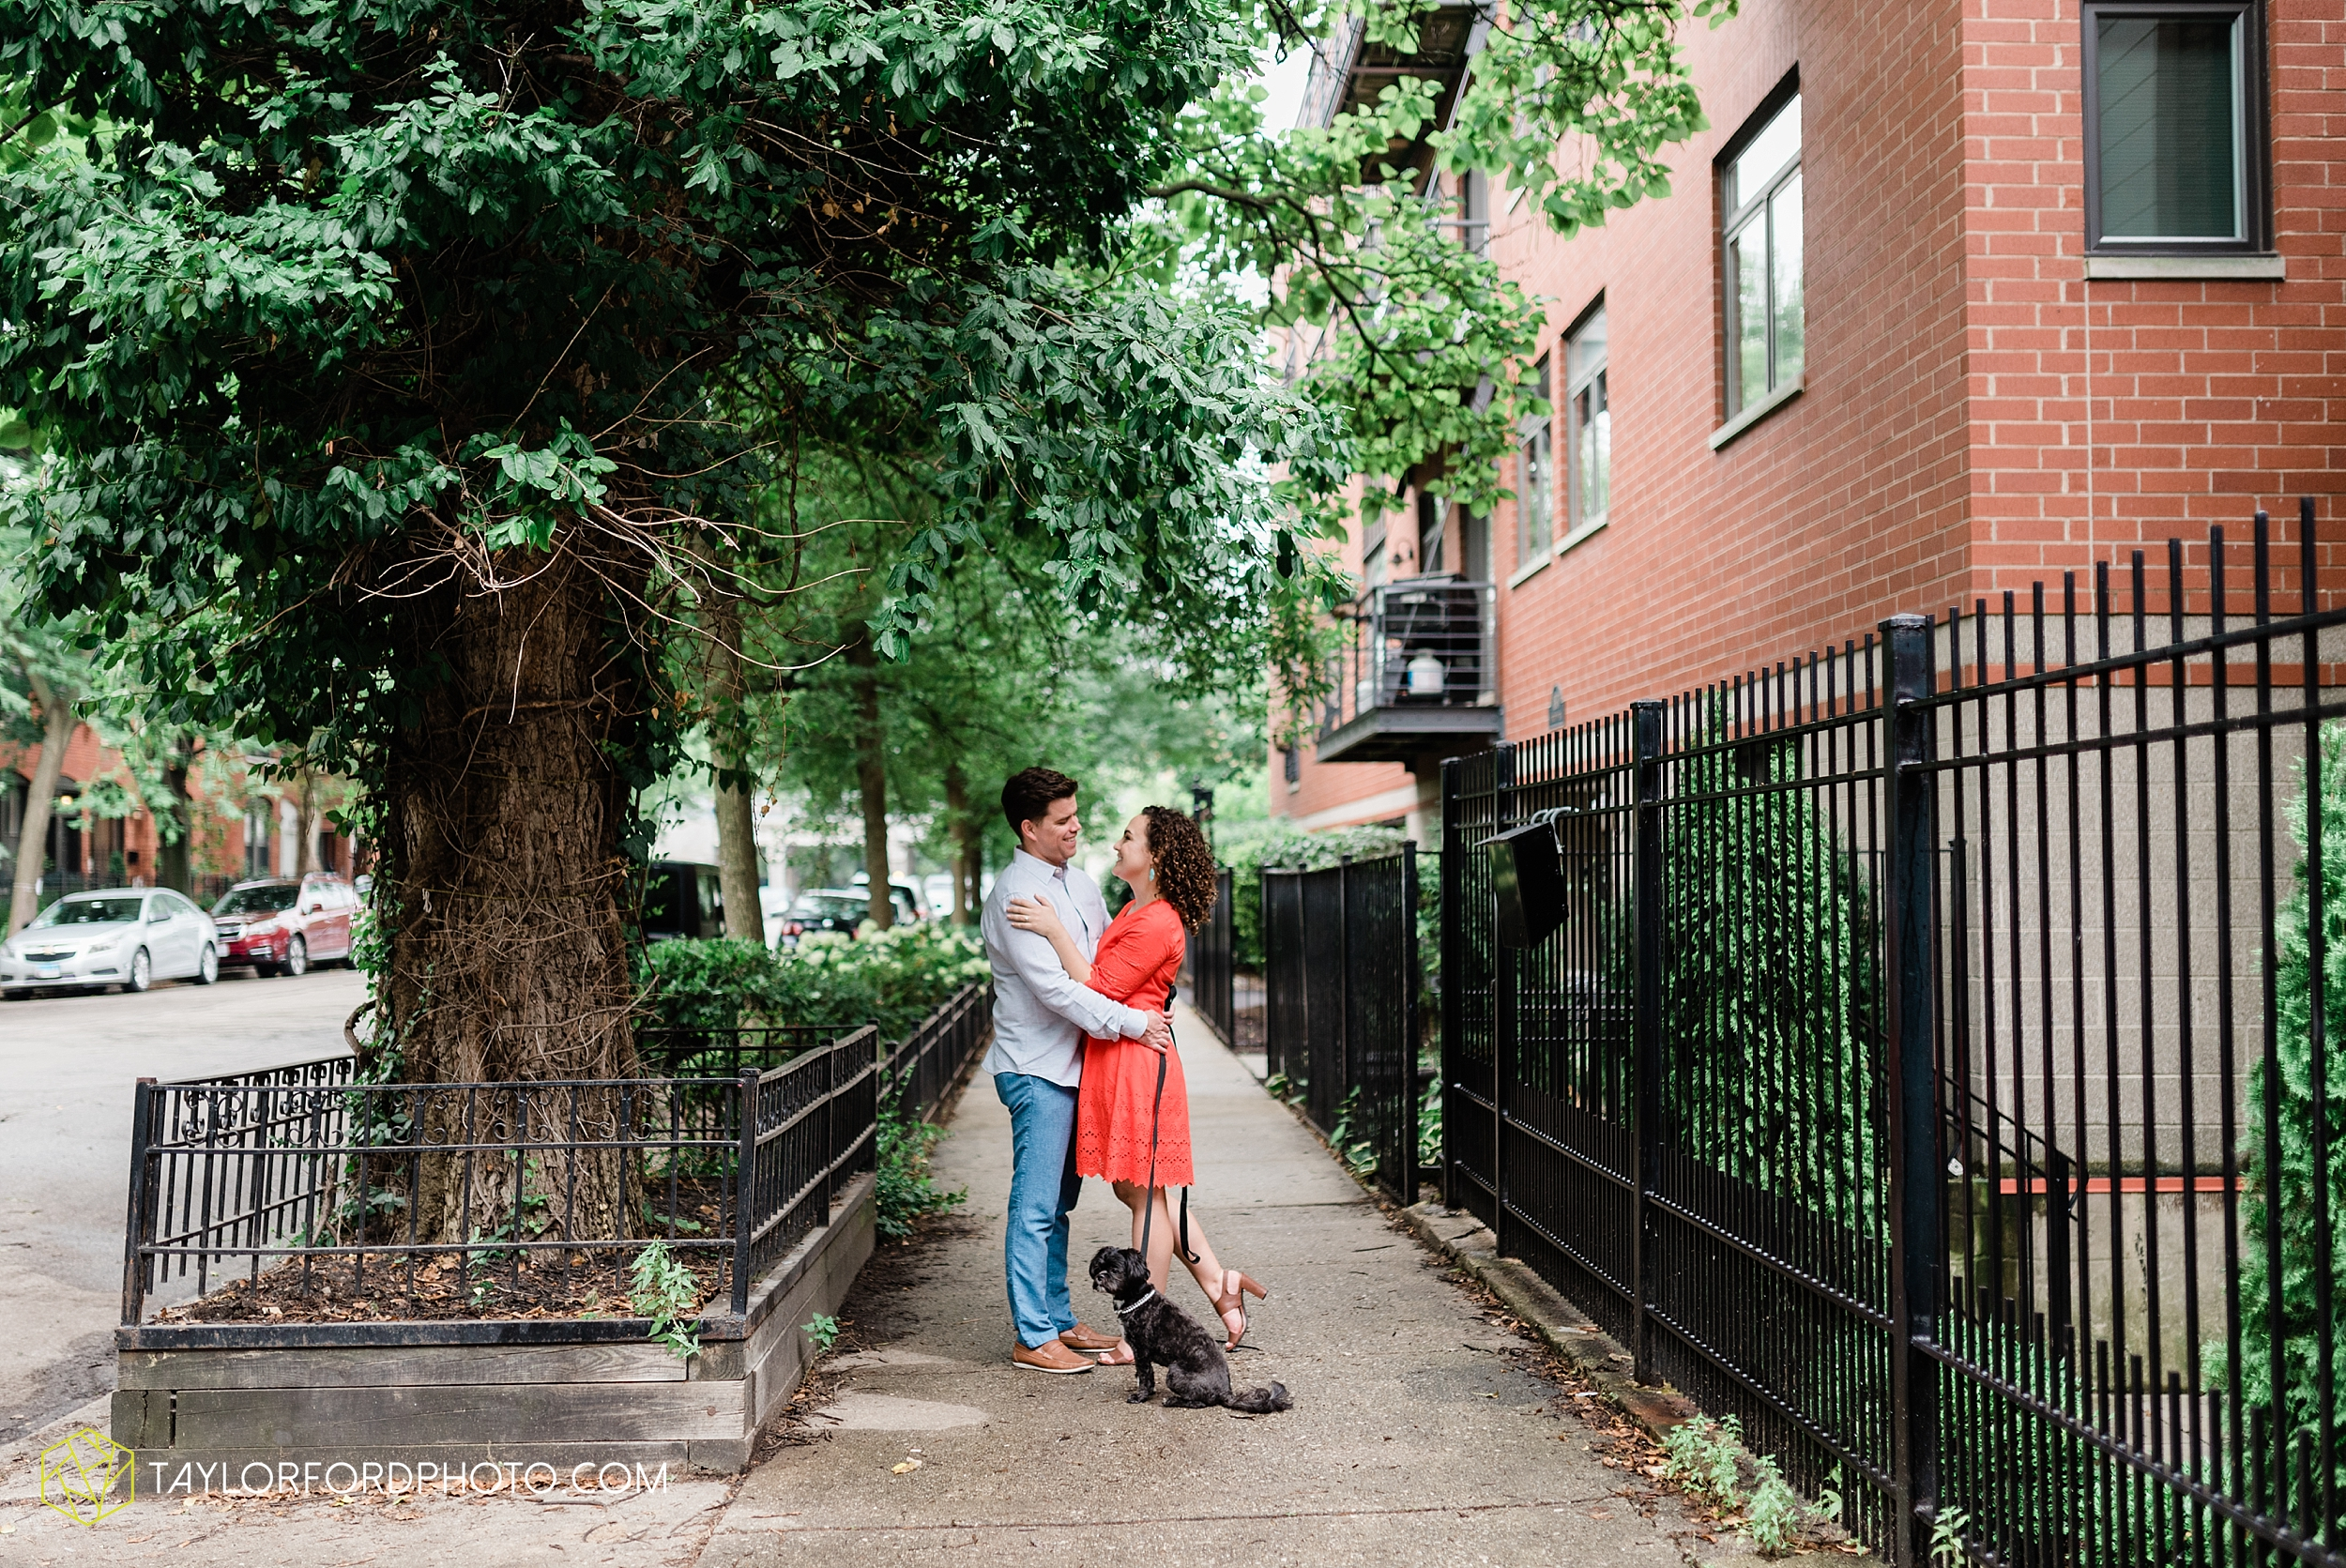 chicago-illinois-ipsento-606-high-line-wicker-park-bucktown-prosecutor-engagement-wedding-photographer-Taylor-Ford-Photography_8715.jpg